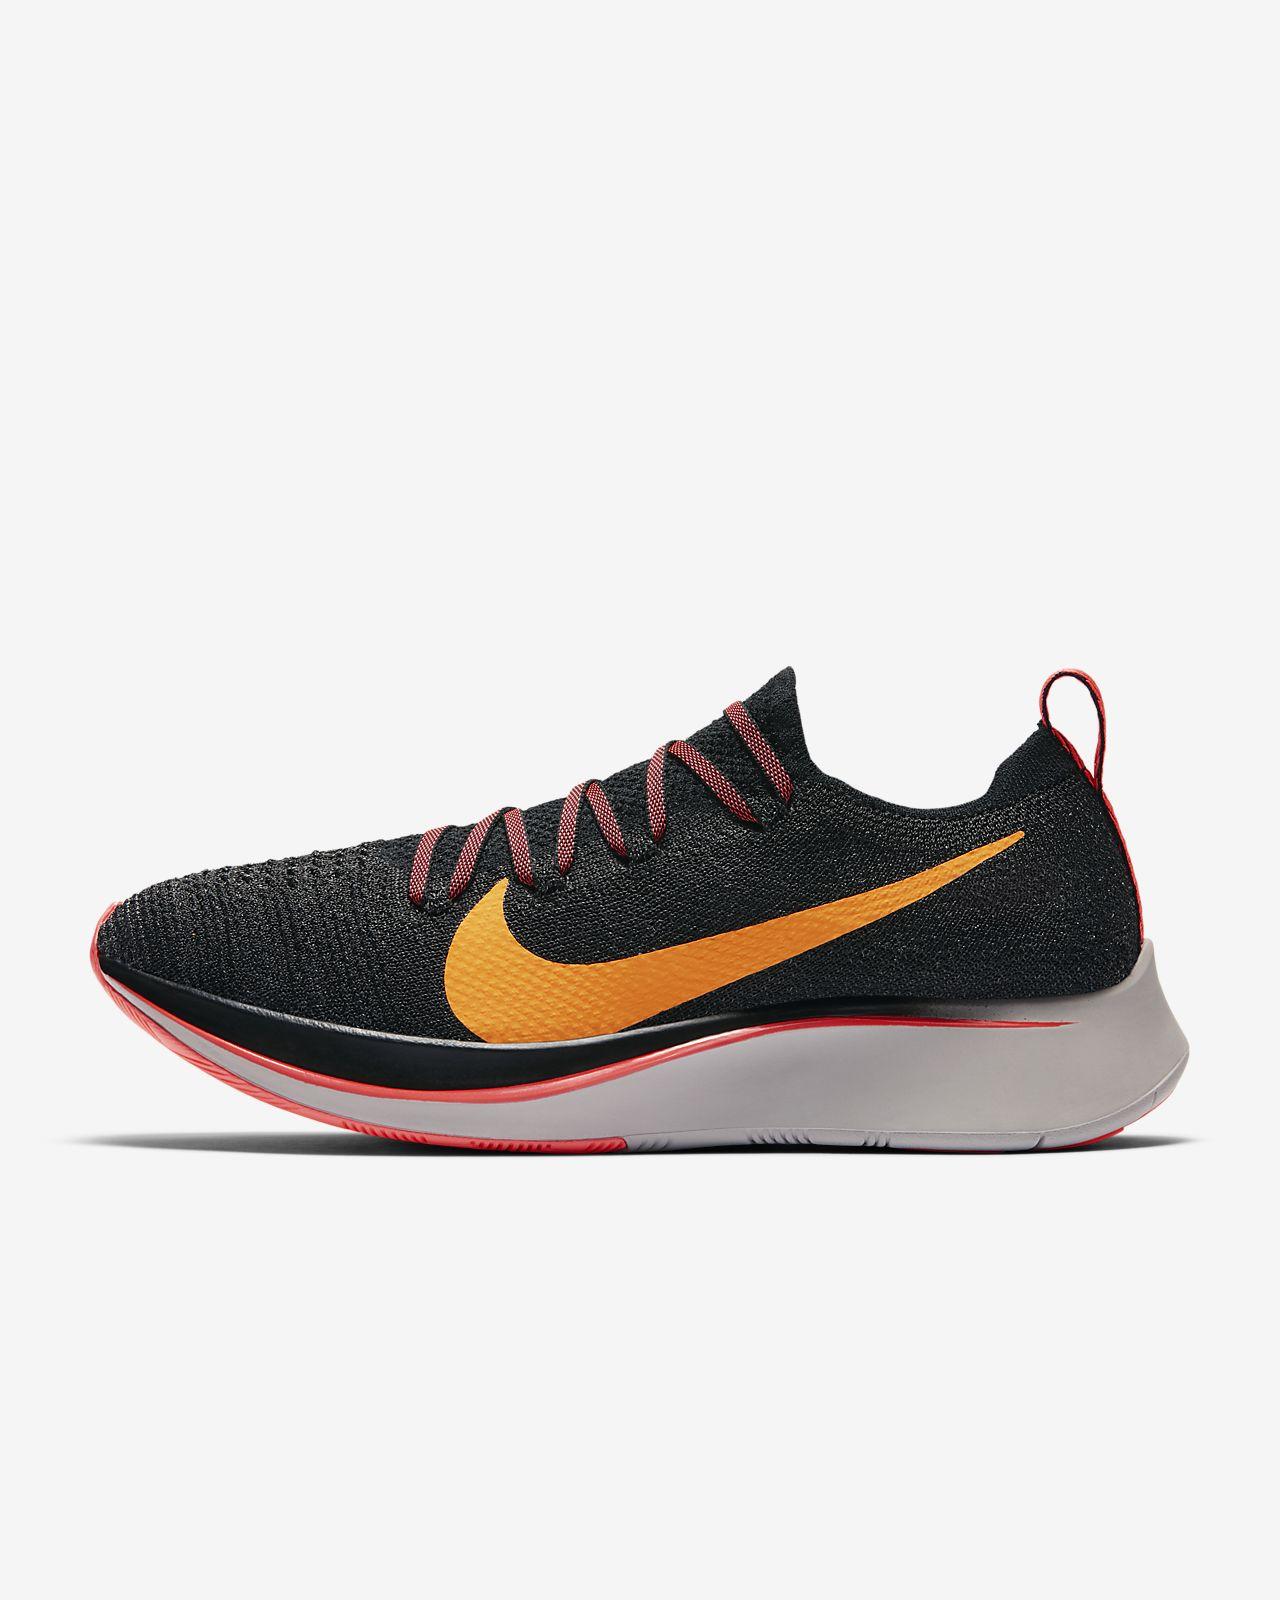 Descuento Animado Venta De Liquidación Nike Libera 5.0 V2